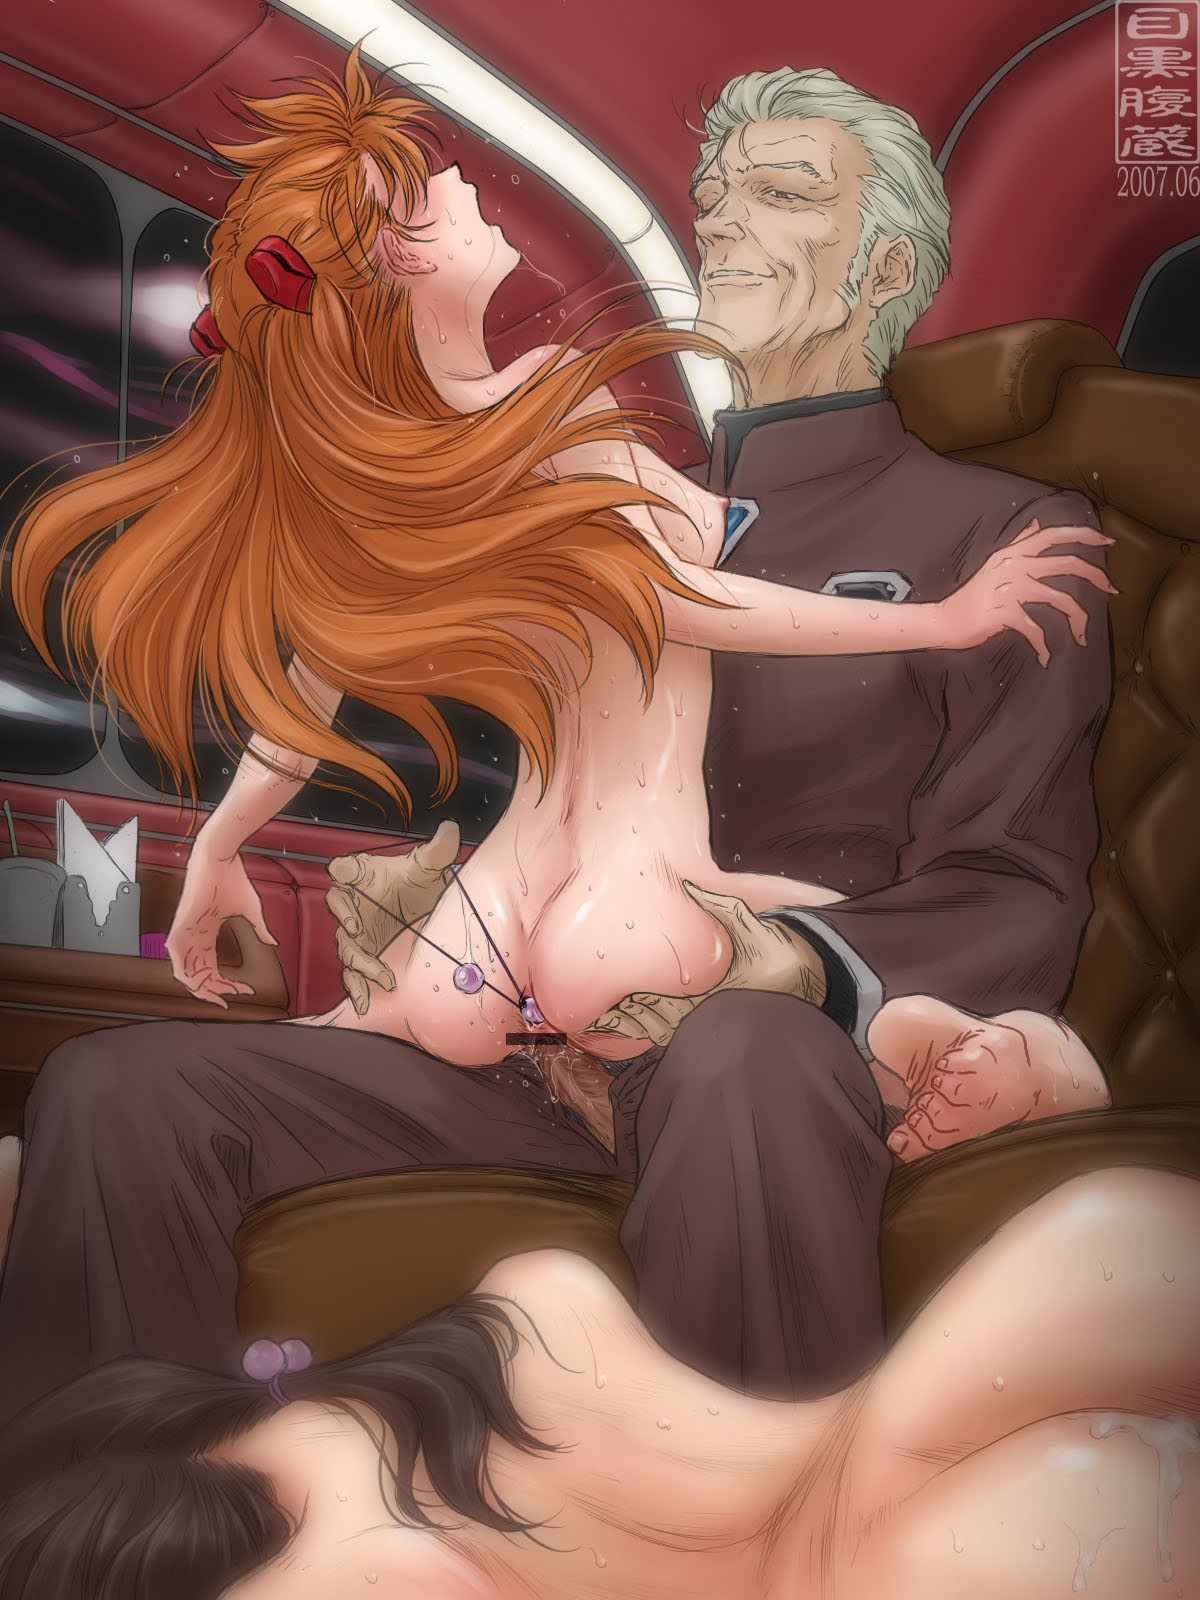 nude asuka genesis evangelion neon Naruto has a pet fox fanfiction